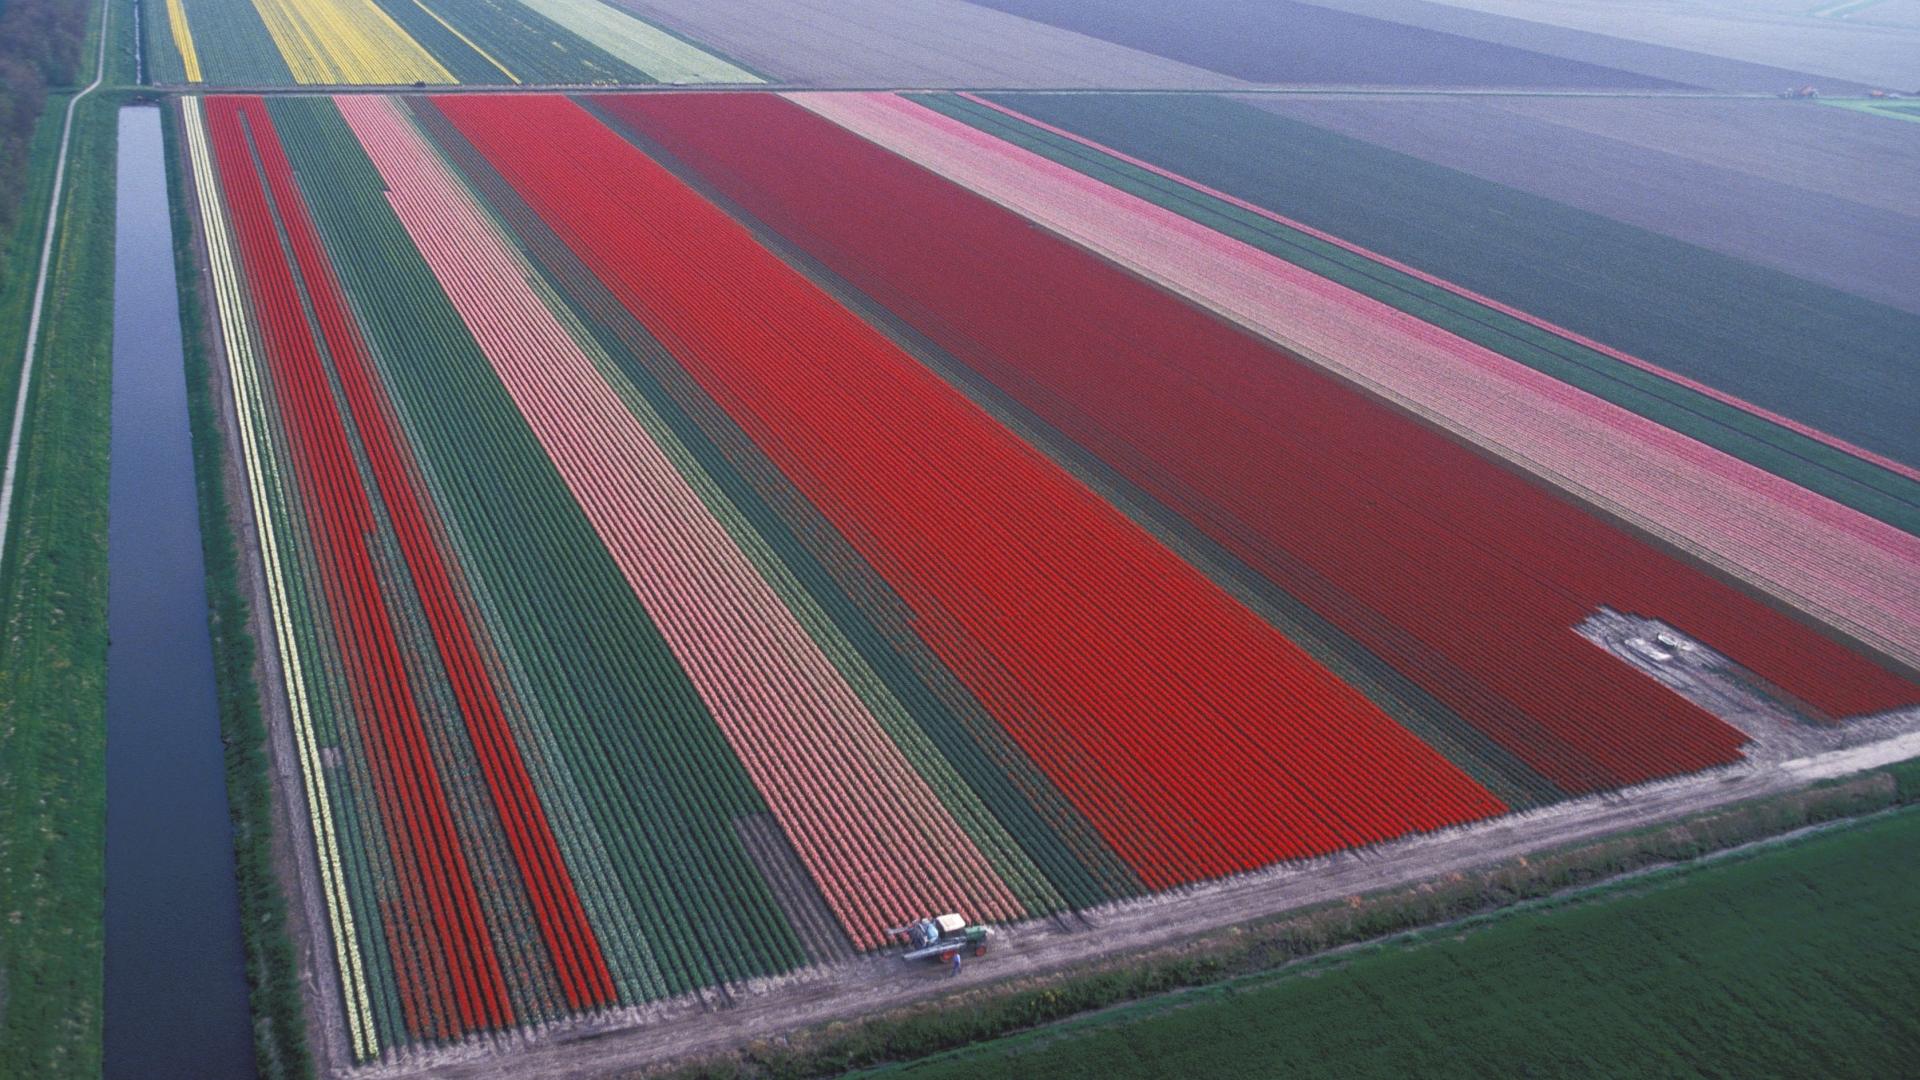 Tulips in Lisse, Netherlands, 1994. (Credit: Marc DeVille/Gamma-Rapho via Getty Images)